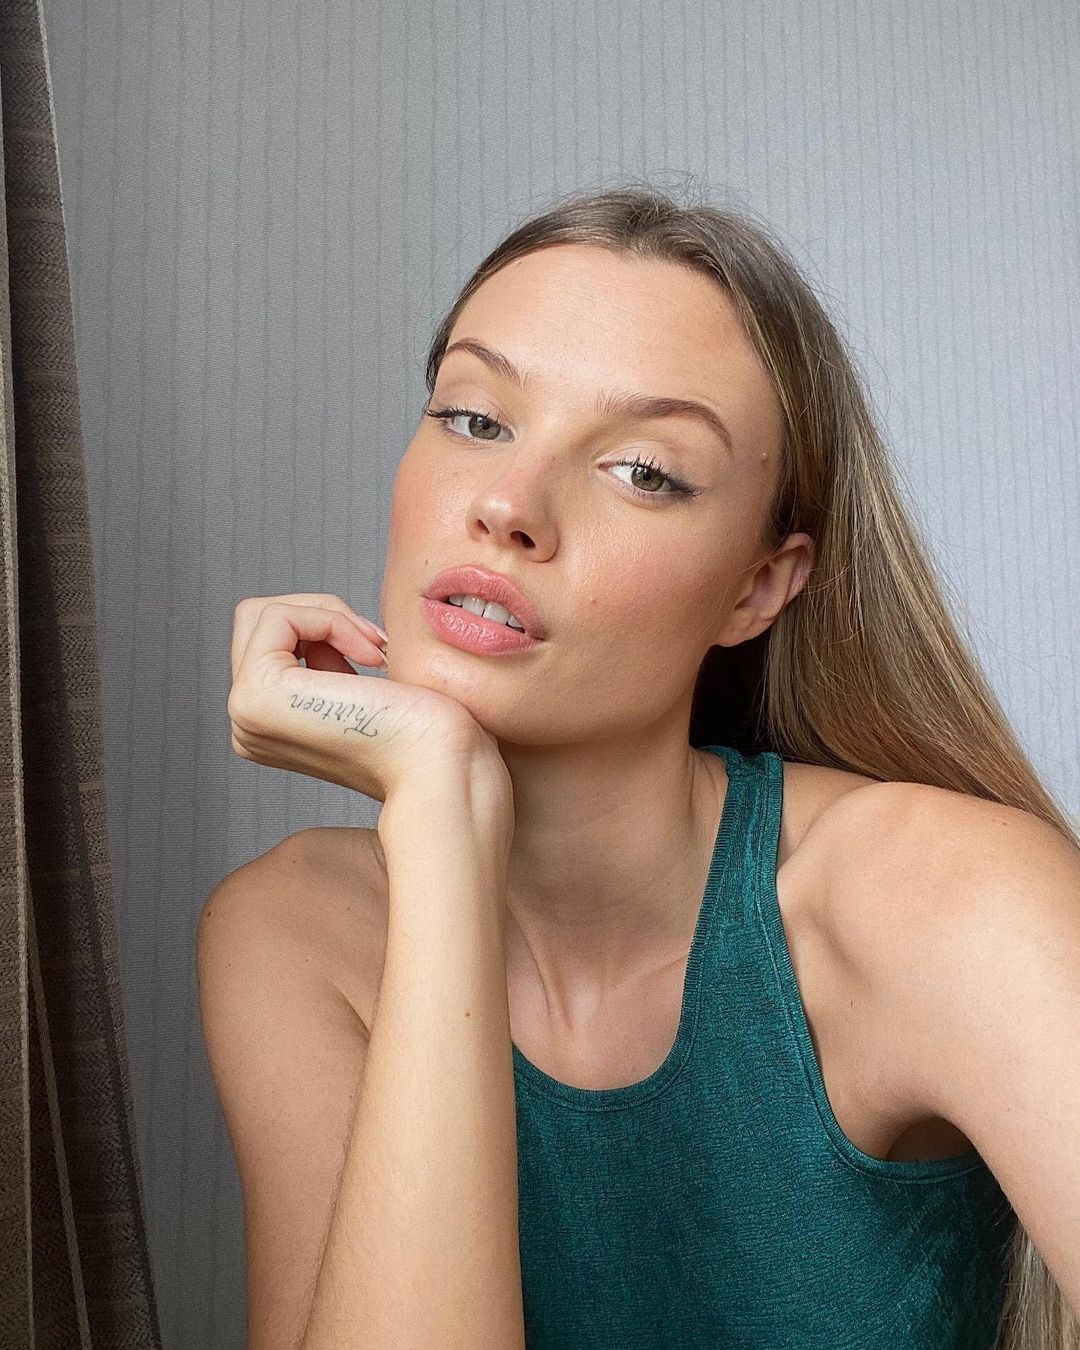 Juliette-Perkins-Wallpapers-Insta-Fit-Bio-12